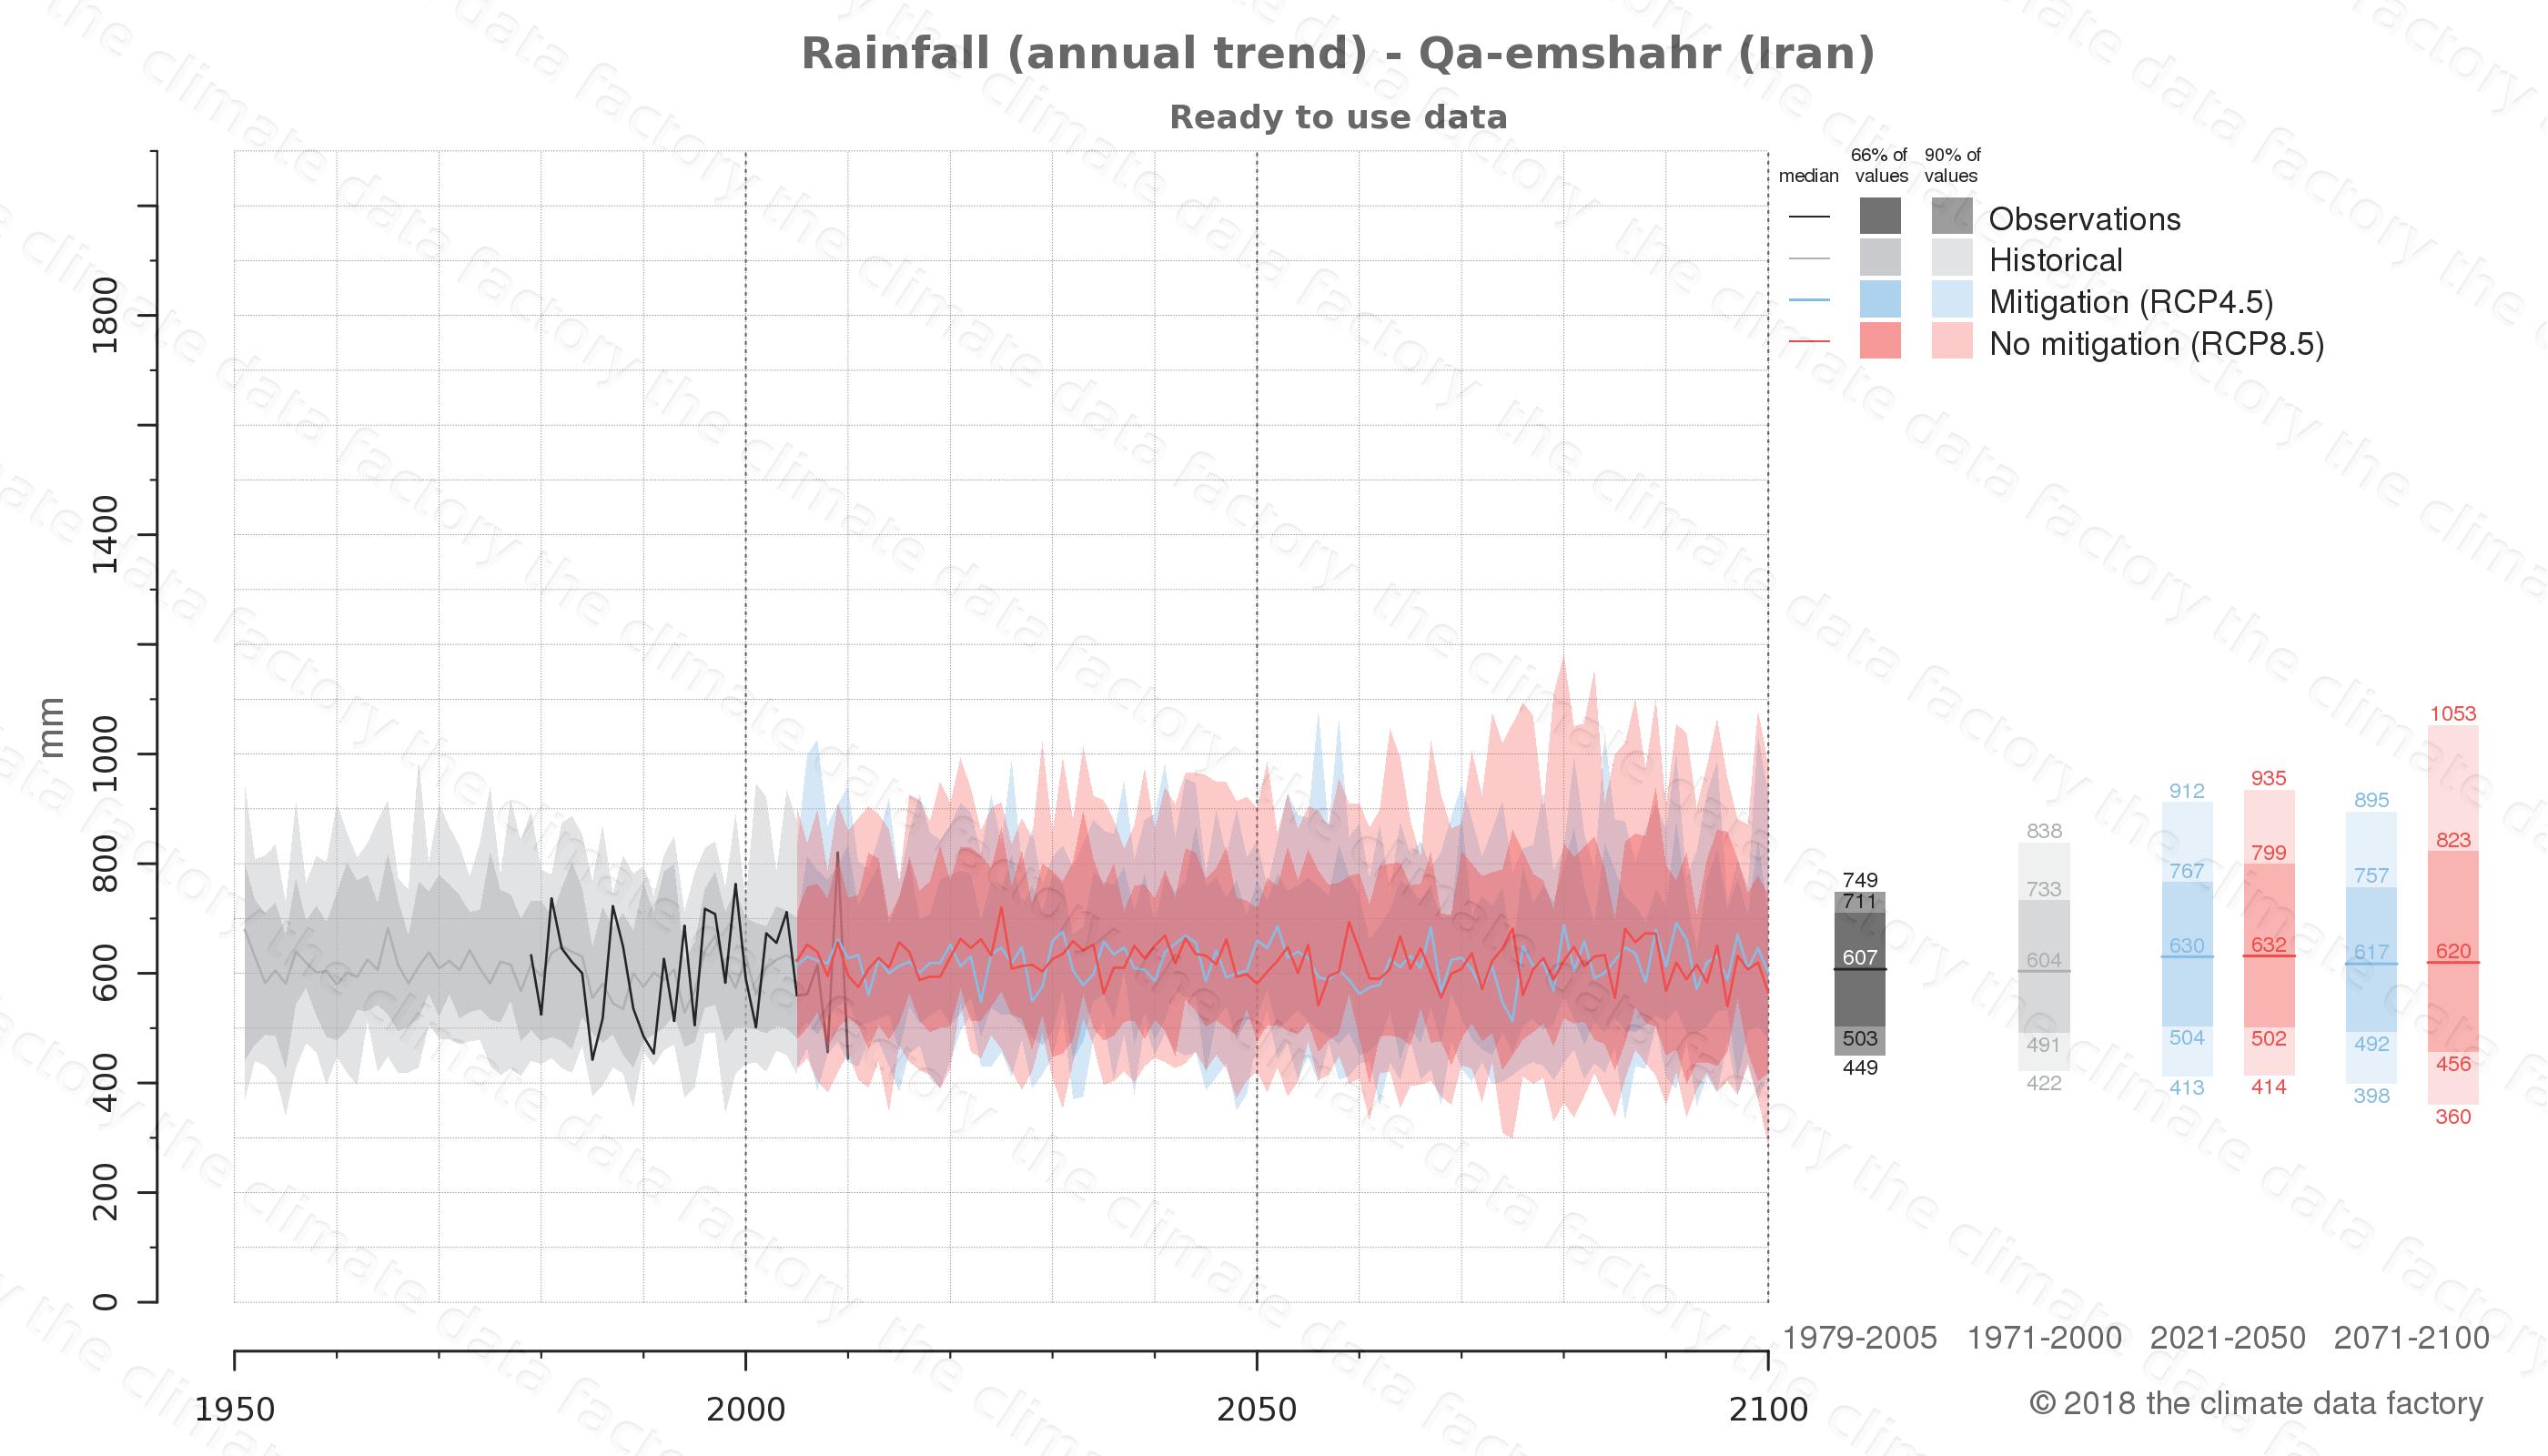 climate change data policy adaptation climate graph city data rainfall qa-emshahr iran